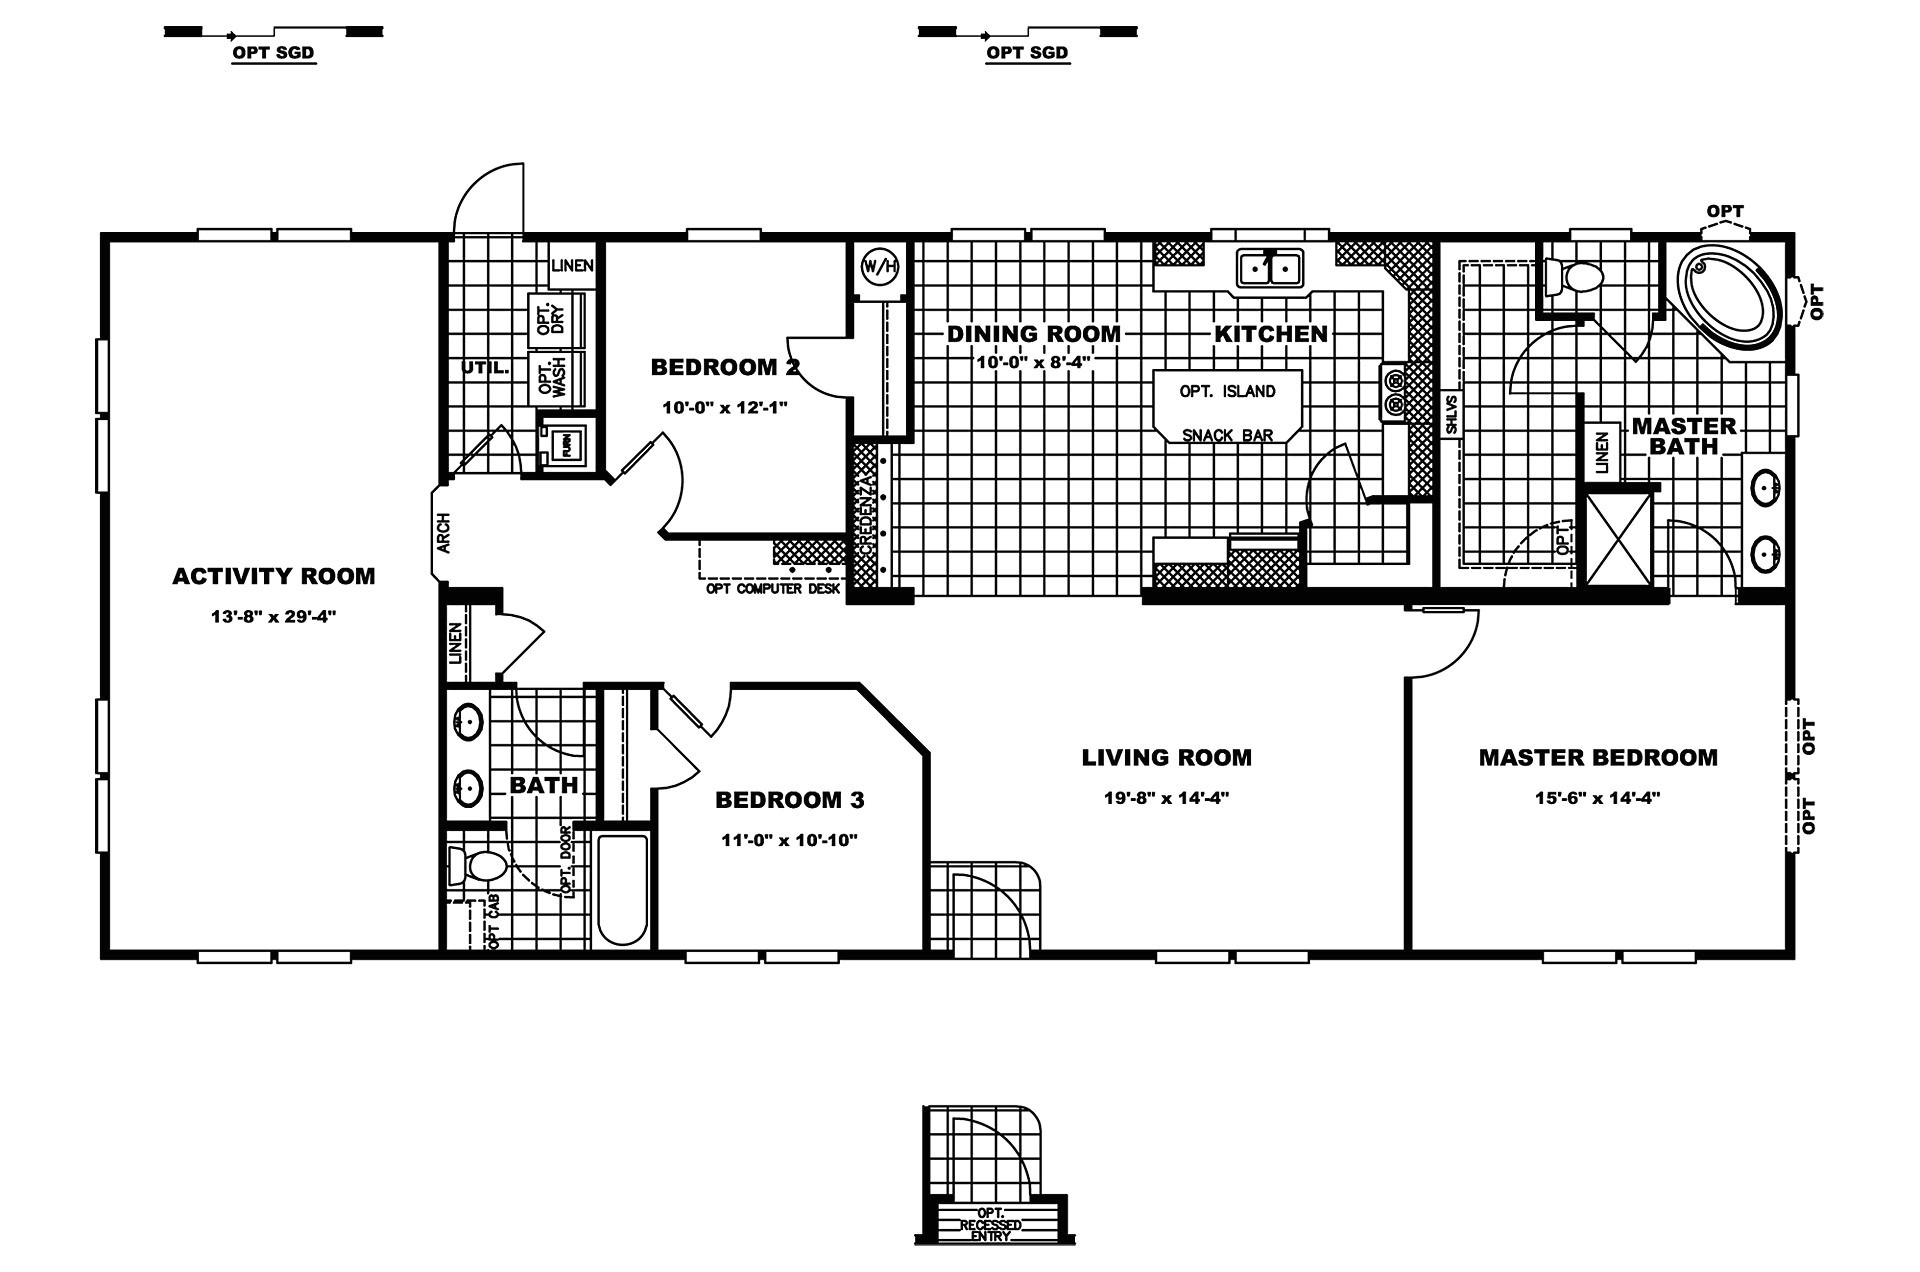 manufacturedhomefloorplan floorplan 5049 state ok city asher